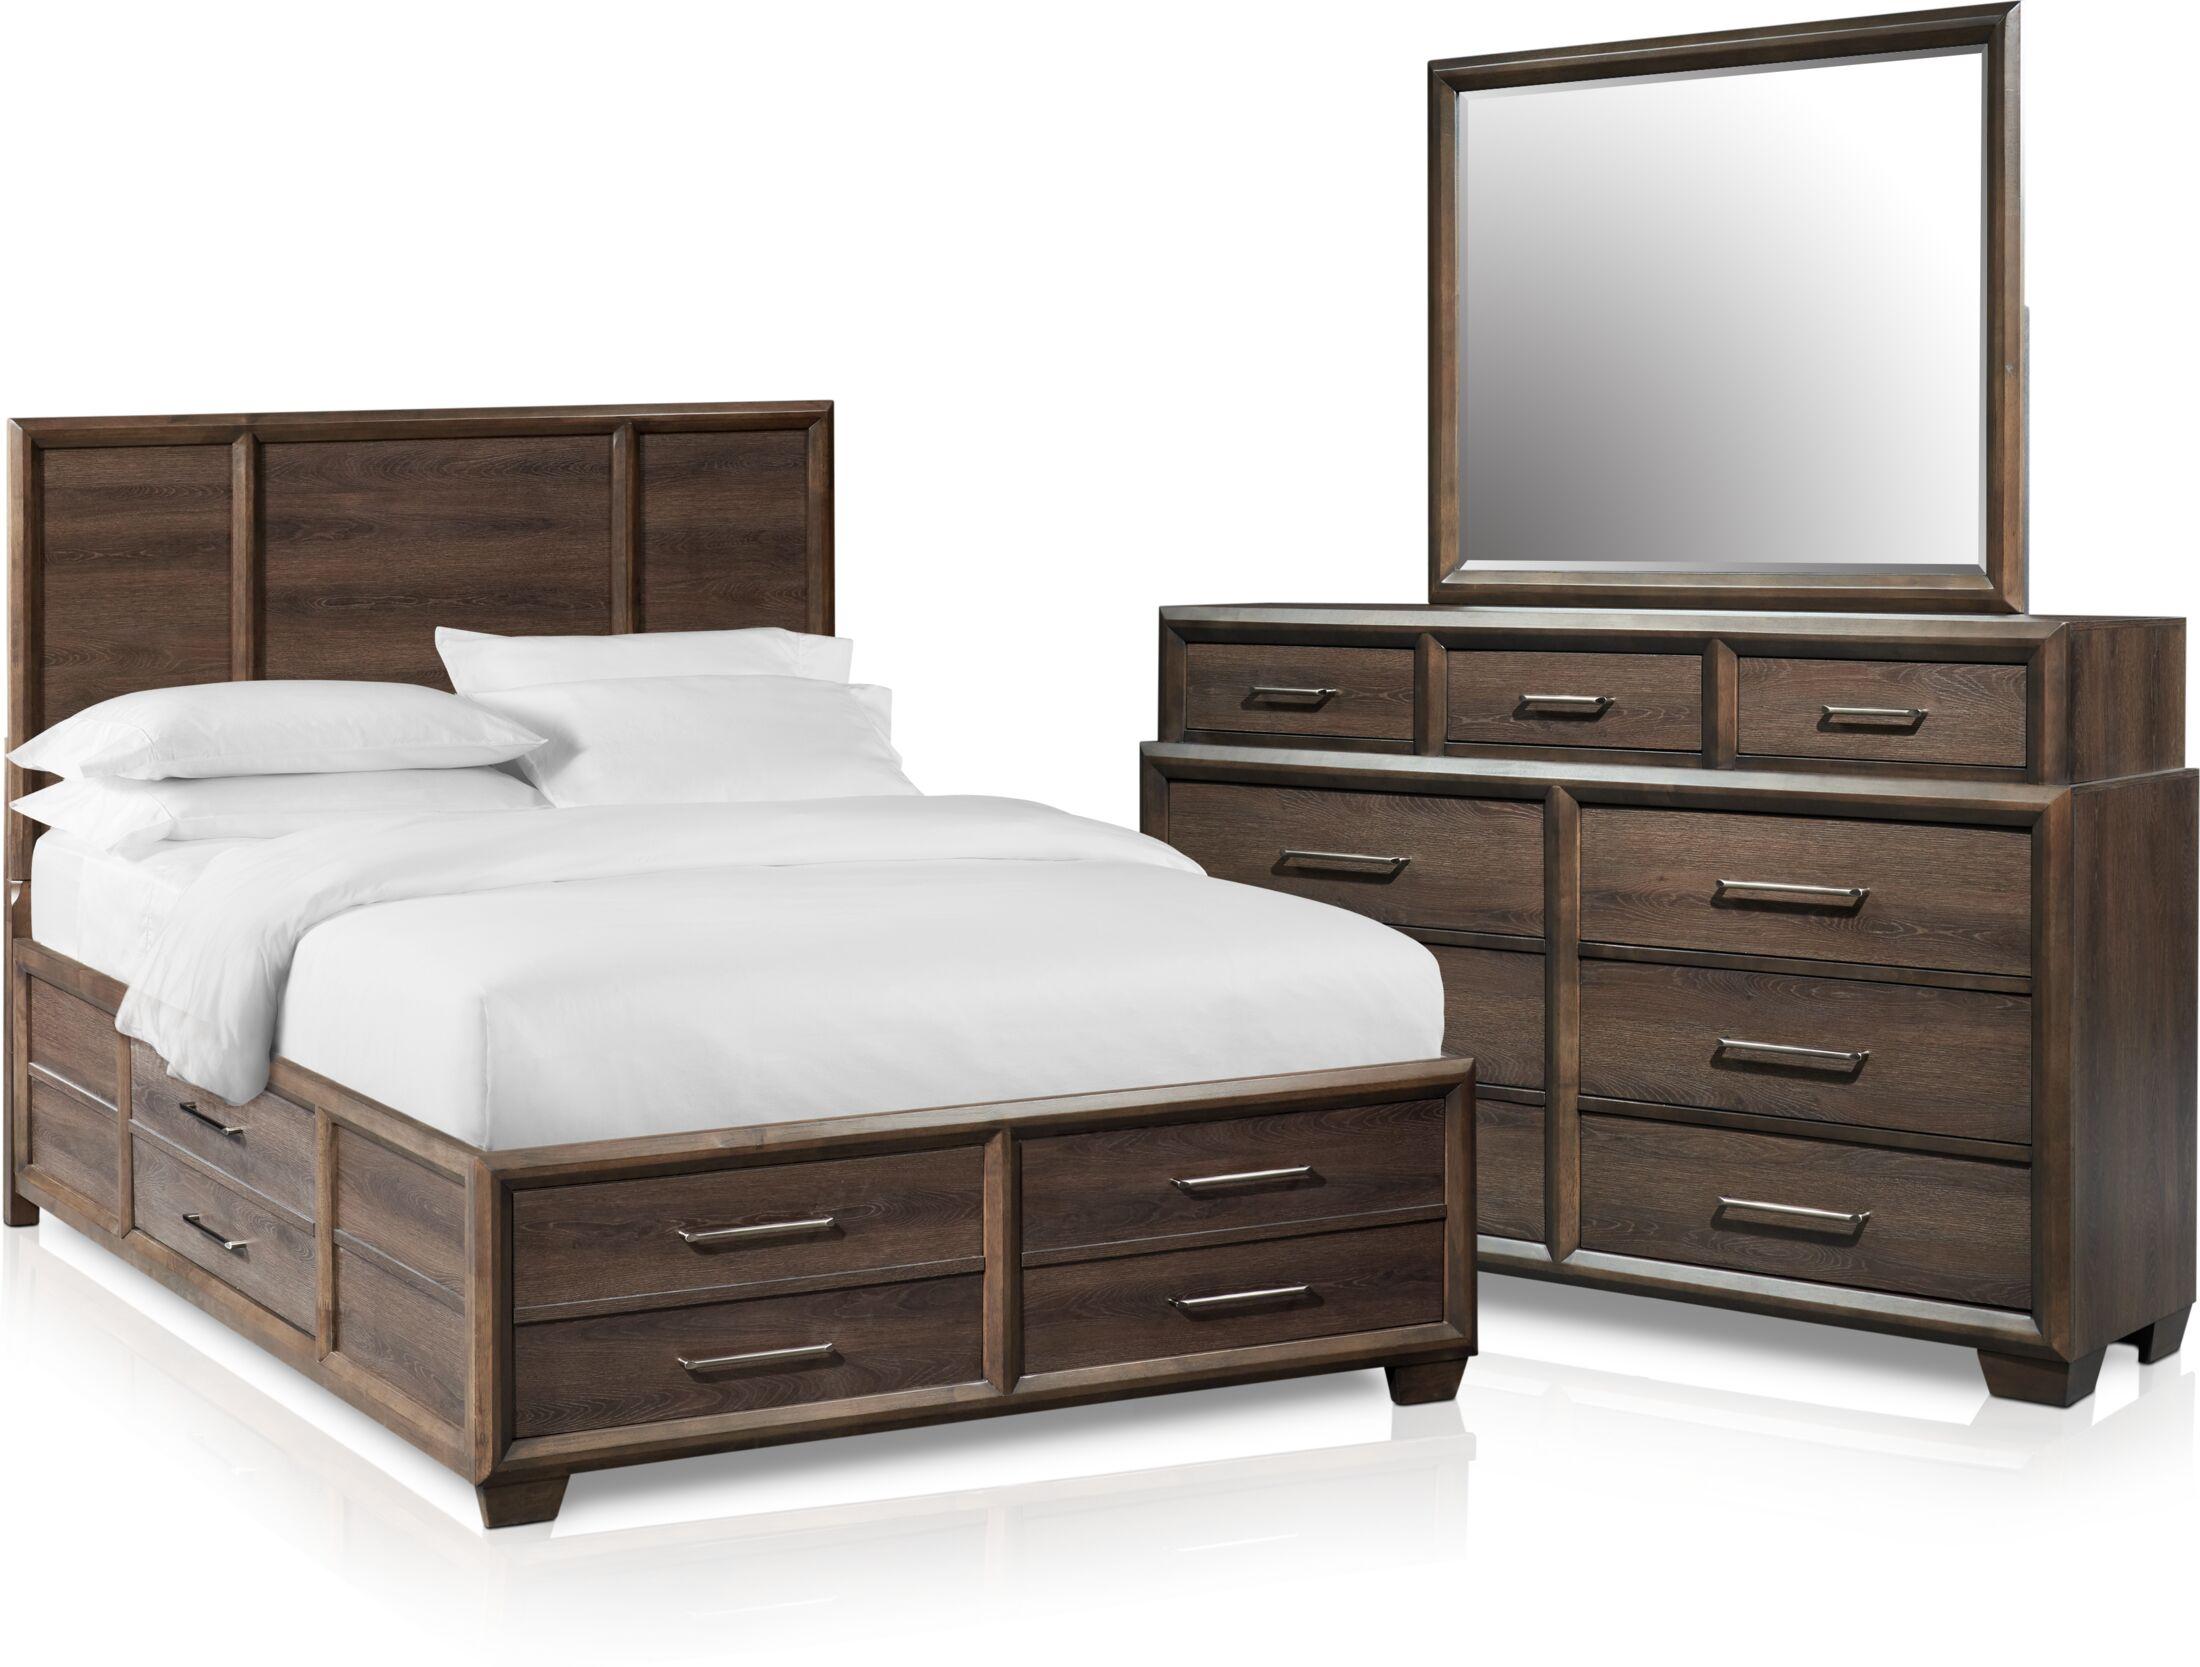 Bedroom Furniture - Dakota 5-Piece Panel Storage Bedroom Set with Dresser and Mirror